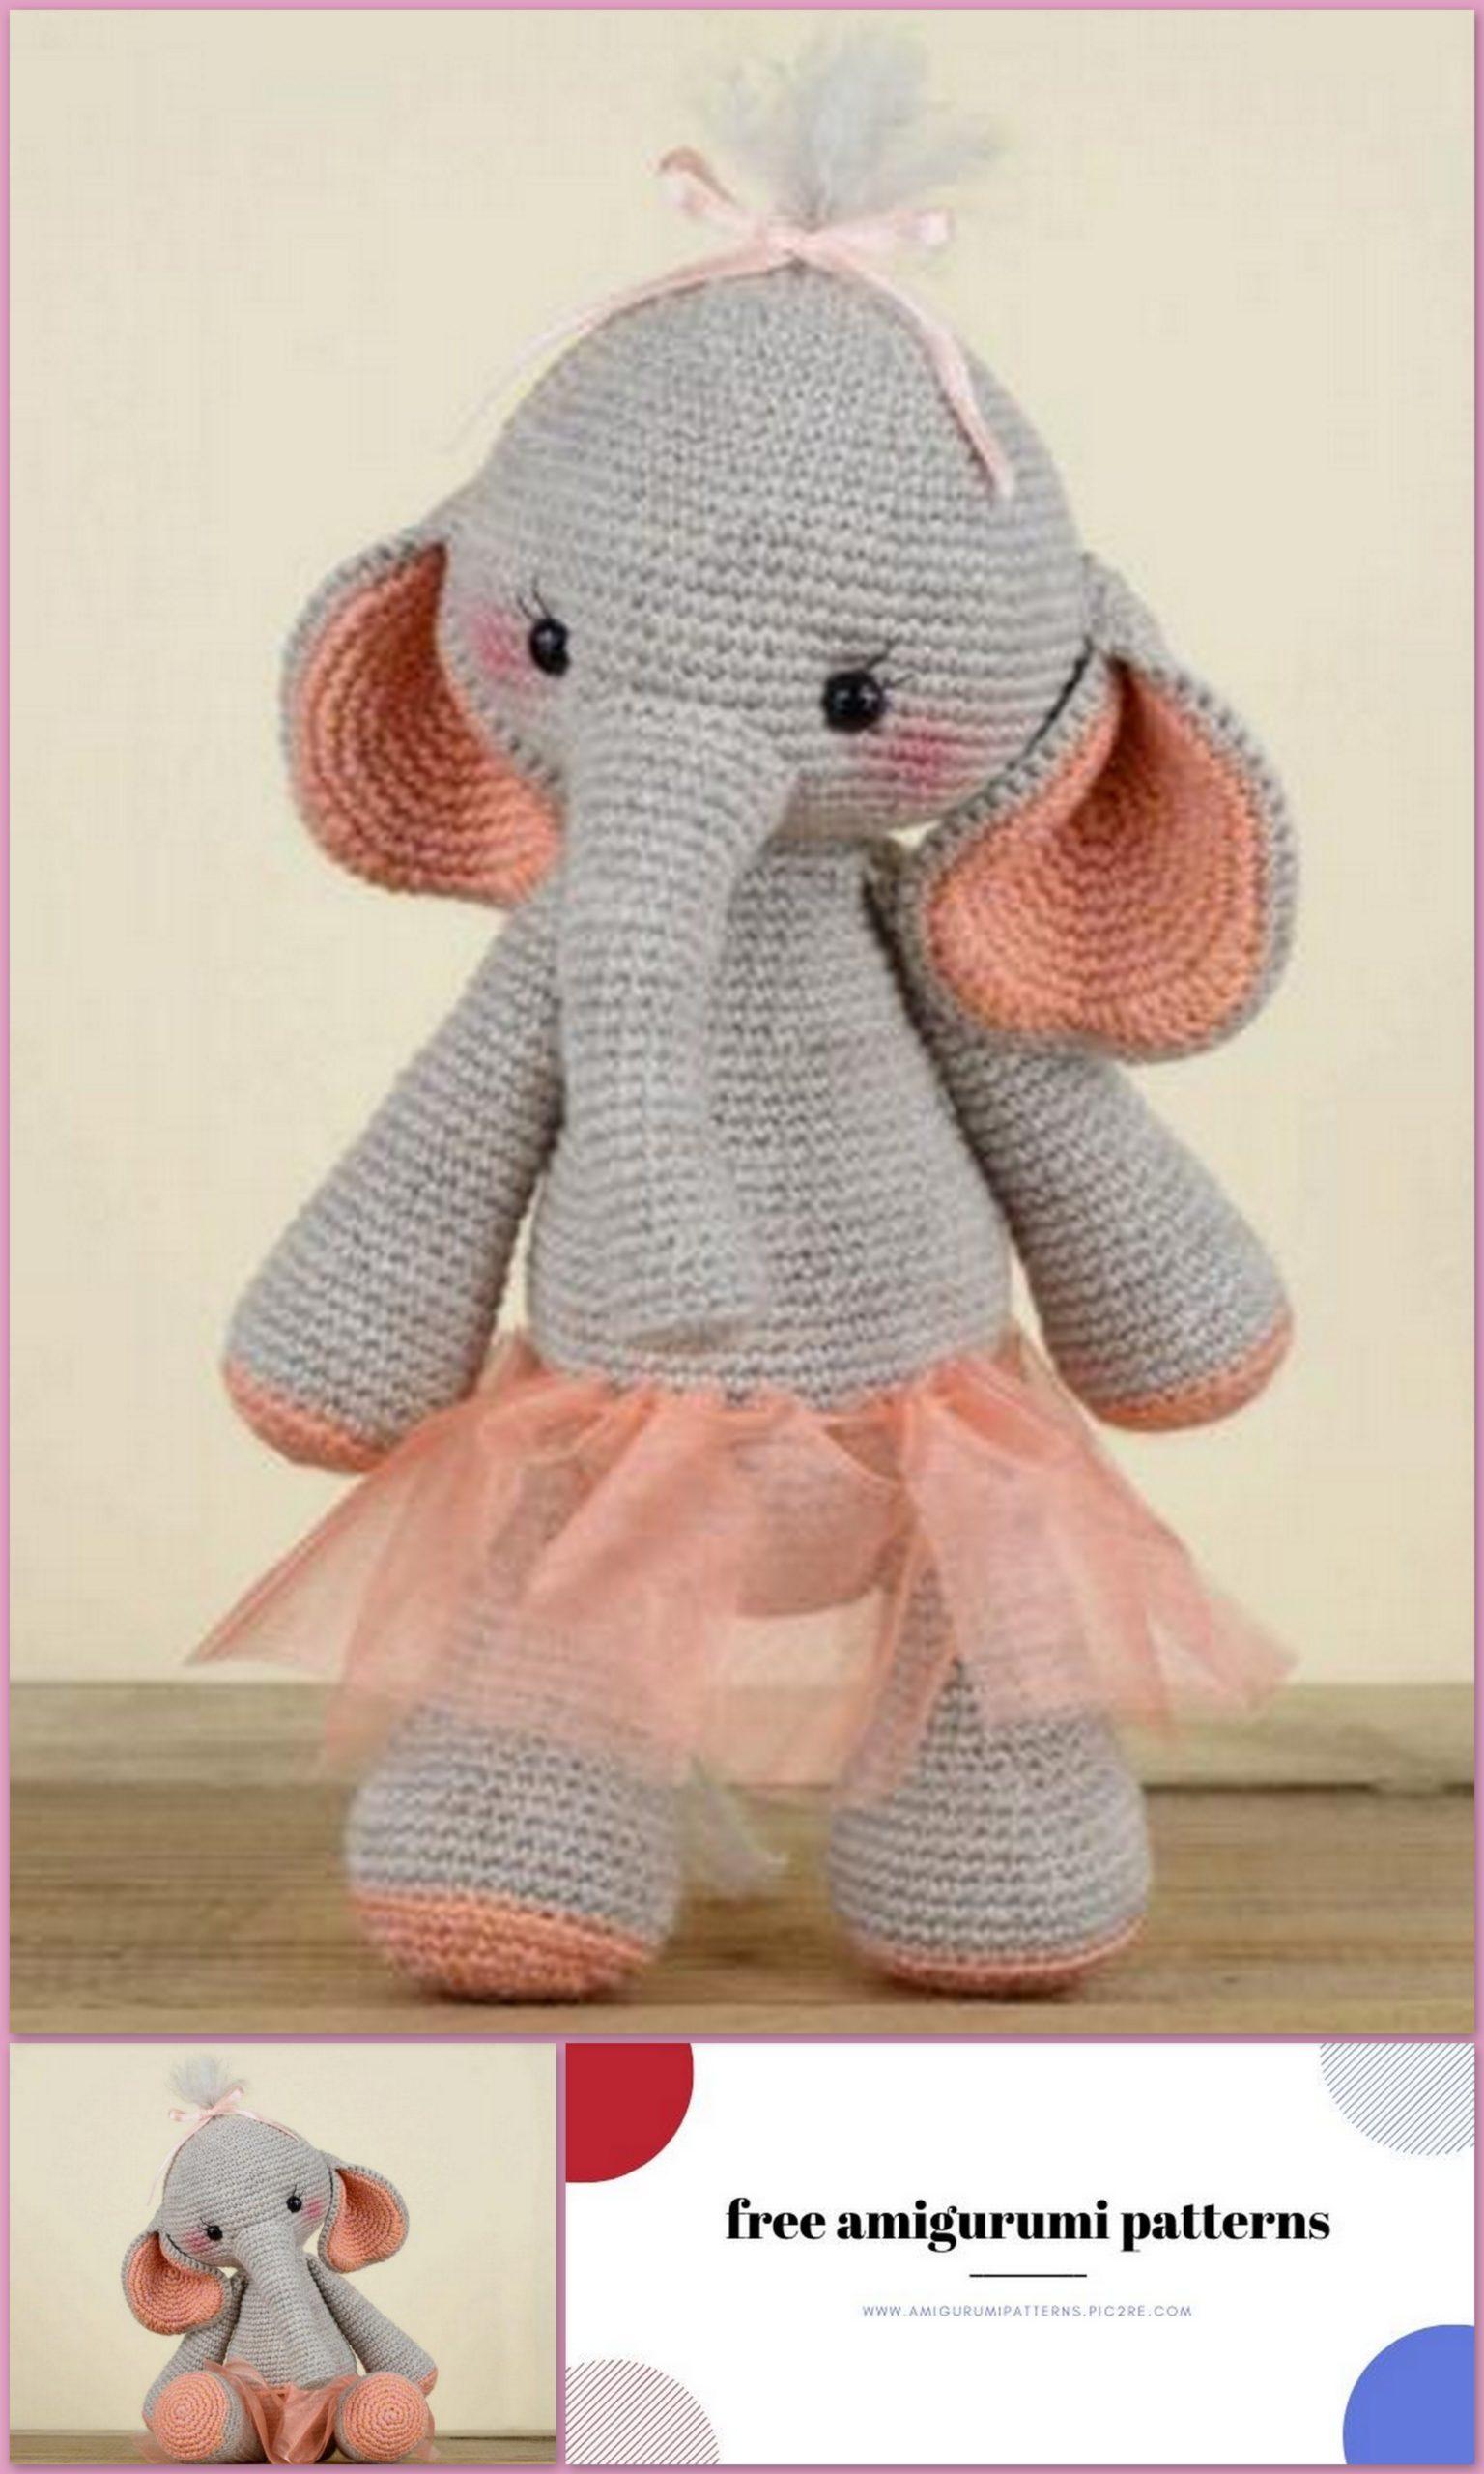 Amigurumi Elephant Free Crochet Pattern - Cool Creativities | 2560x1536